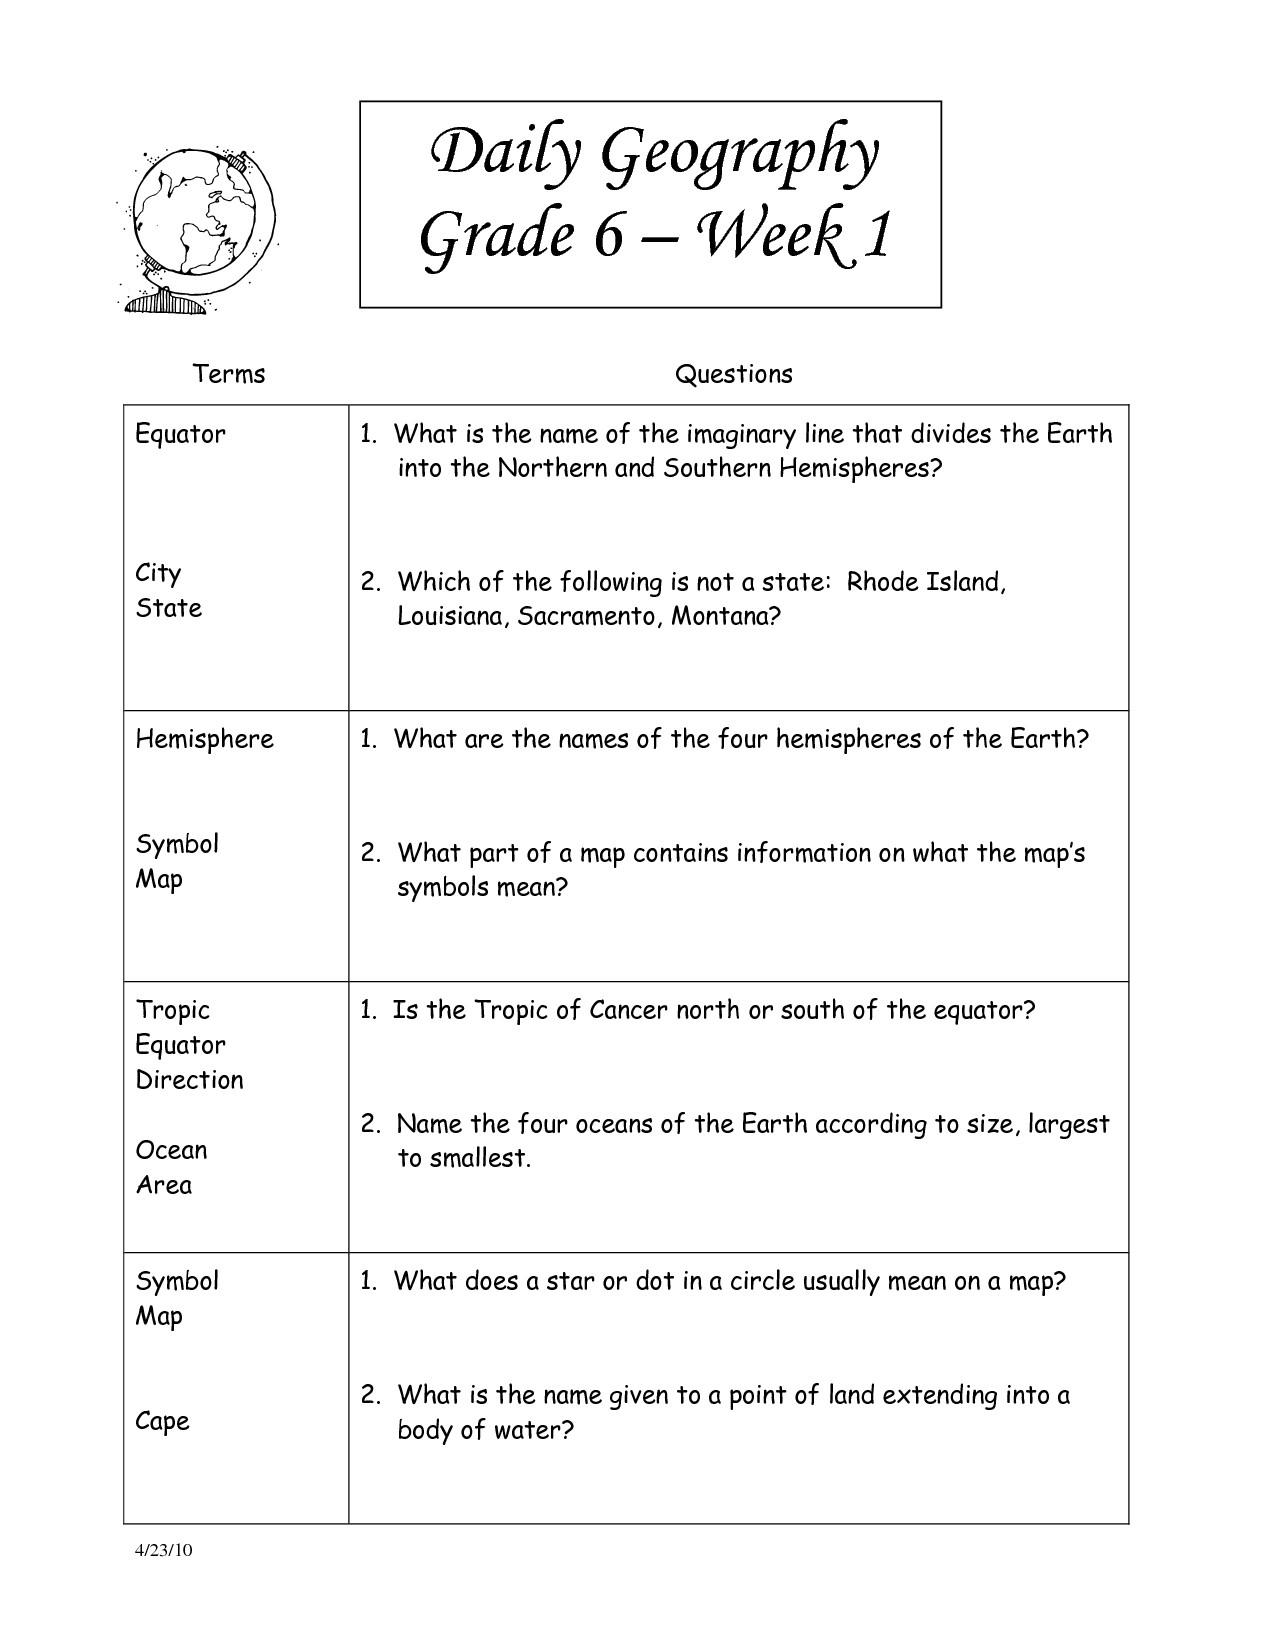 7Th Grade Social Studies Worksheets – Worksheet Template - Free Printable Worksheets For 2Nd Grade Social Studies